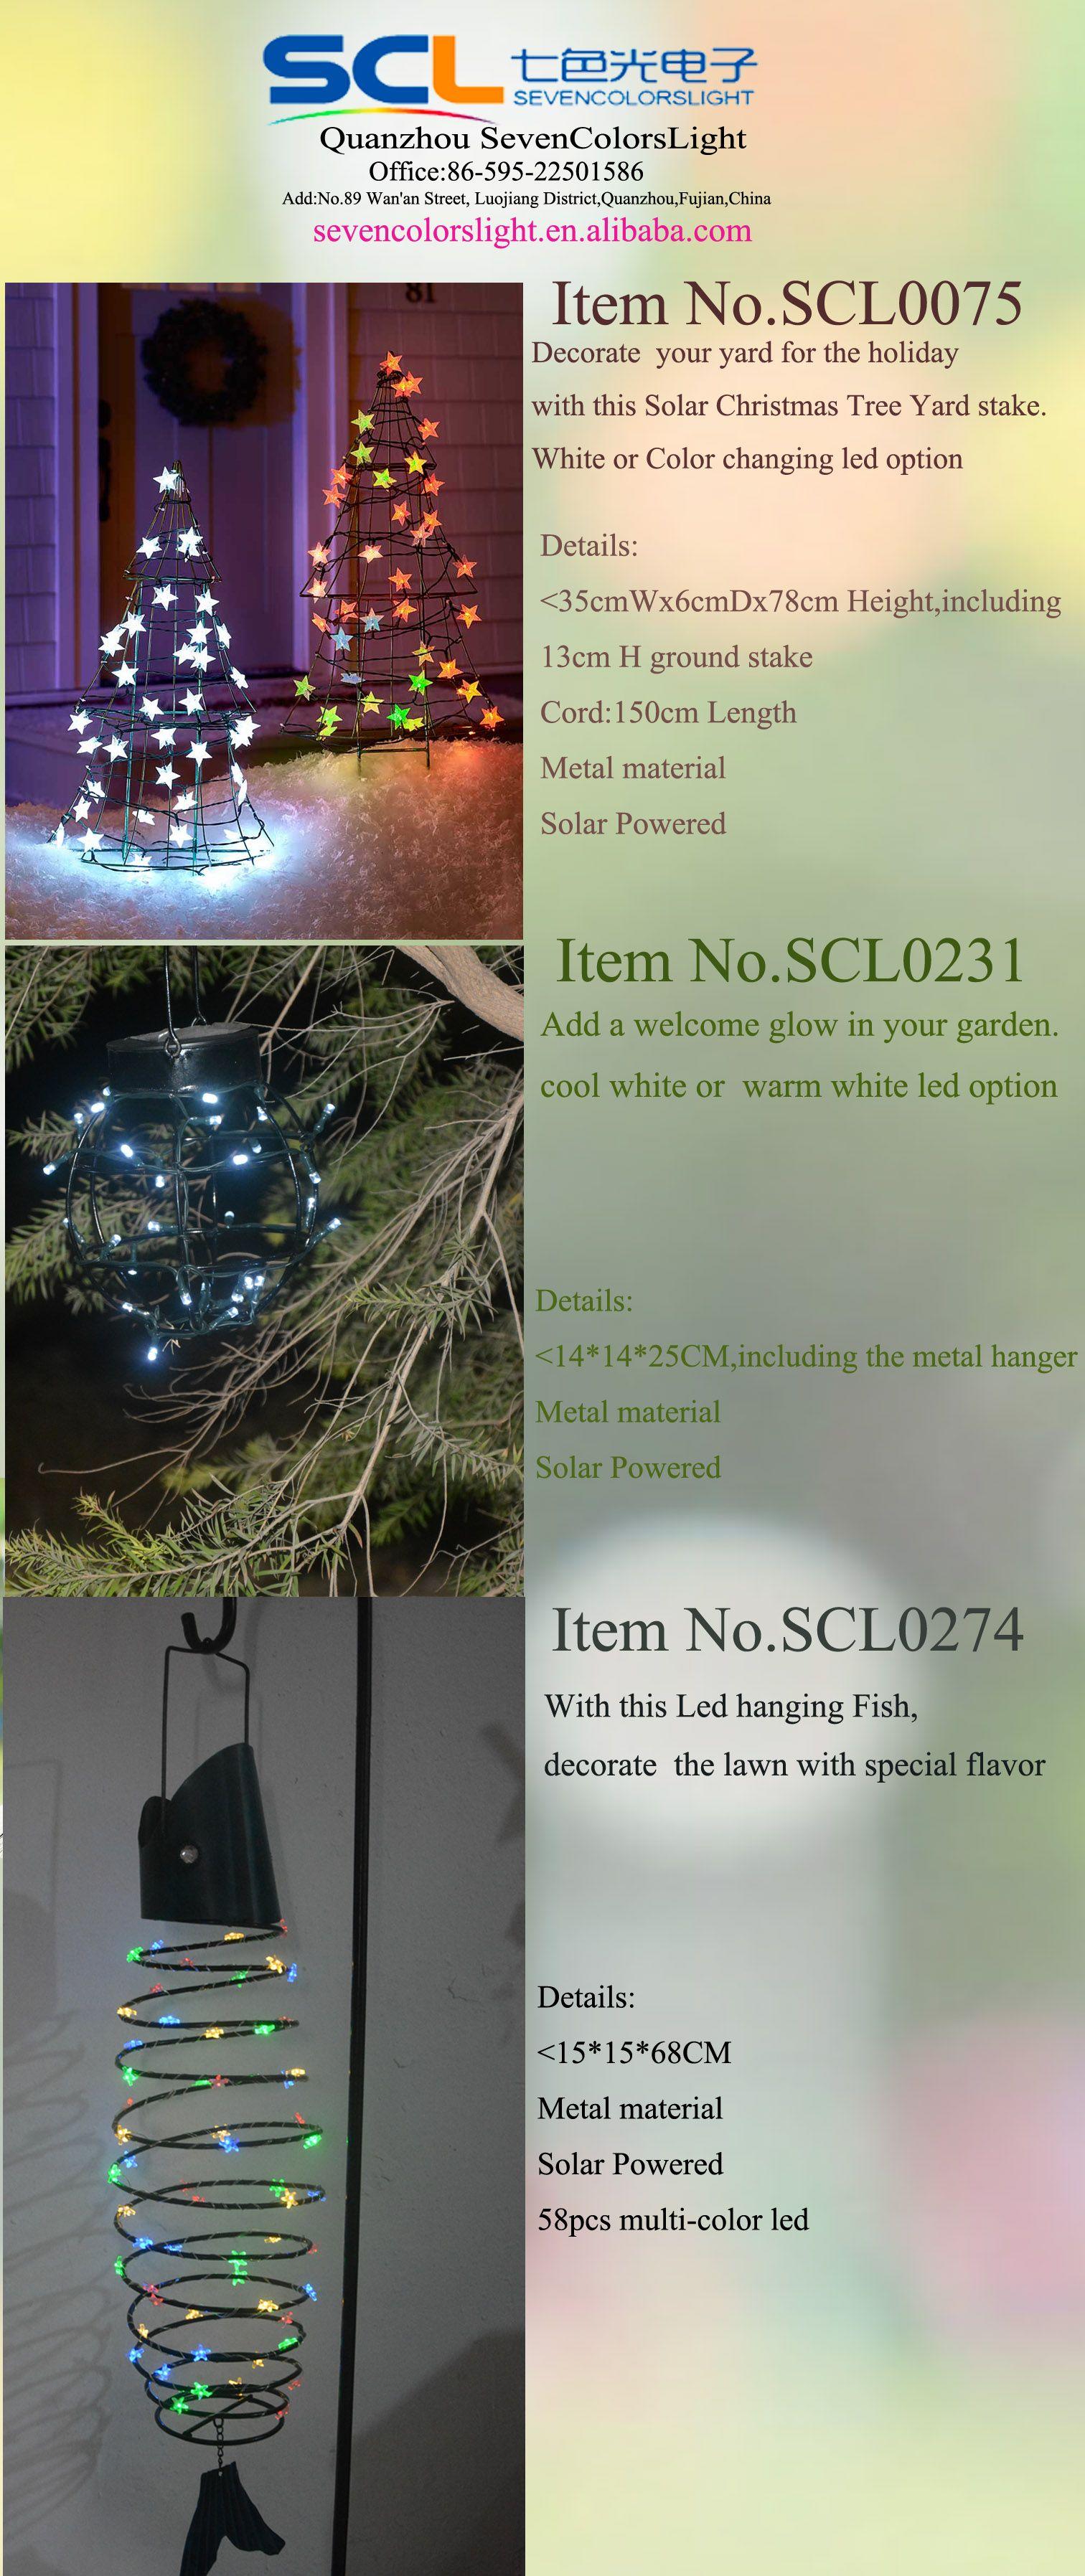 Christmas Yard Metal Tree Metal Lantern Led Hanging Fish With Images Christmas Tree Yard Stakes Solar Christmas Tree Metal Tree